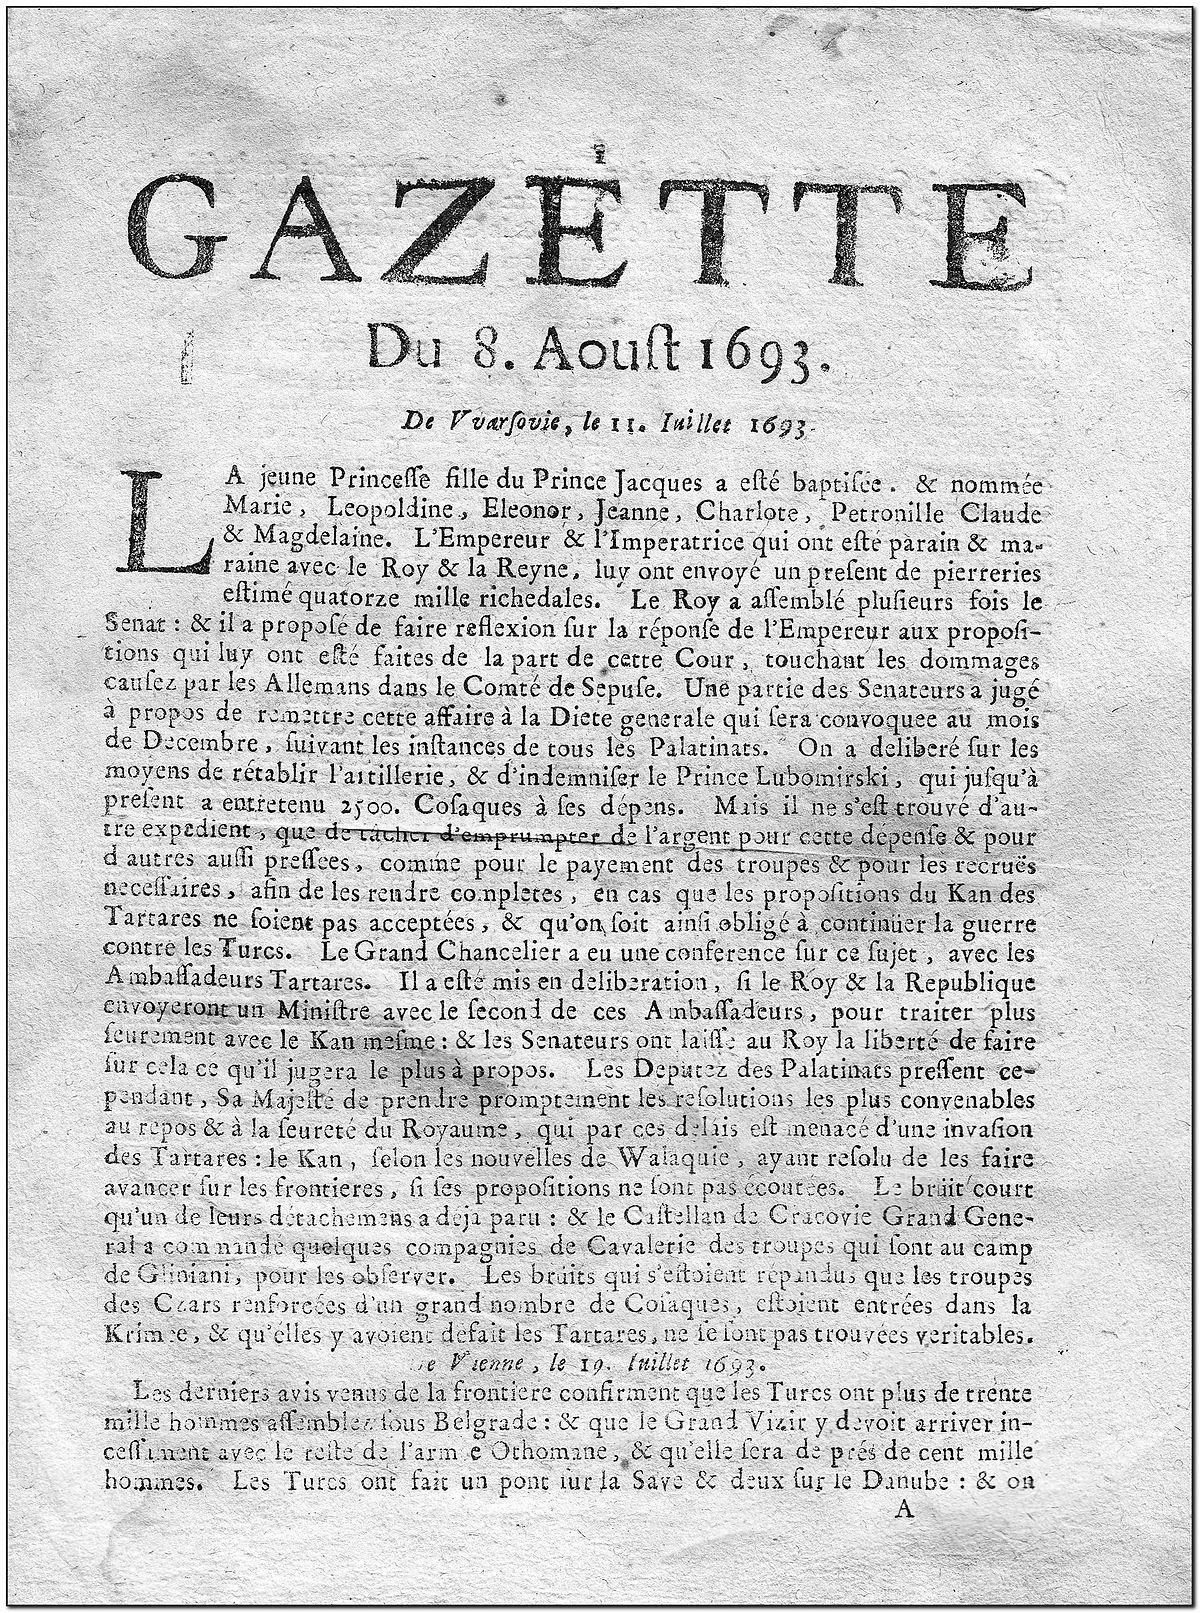 File:Gazette 1693.jpg - Wikimedia Commons